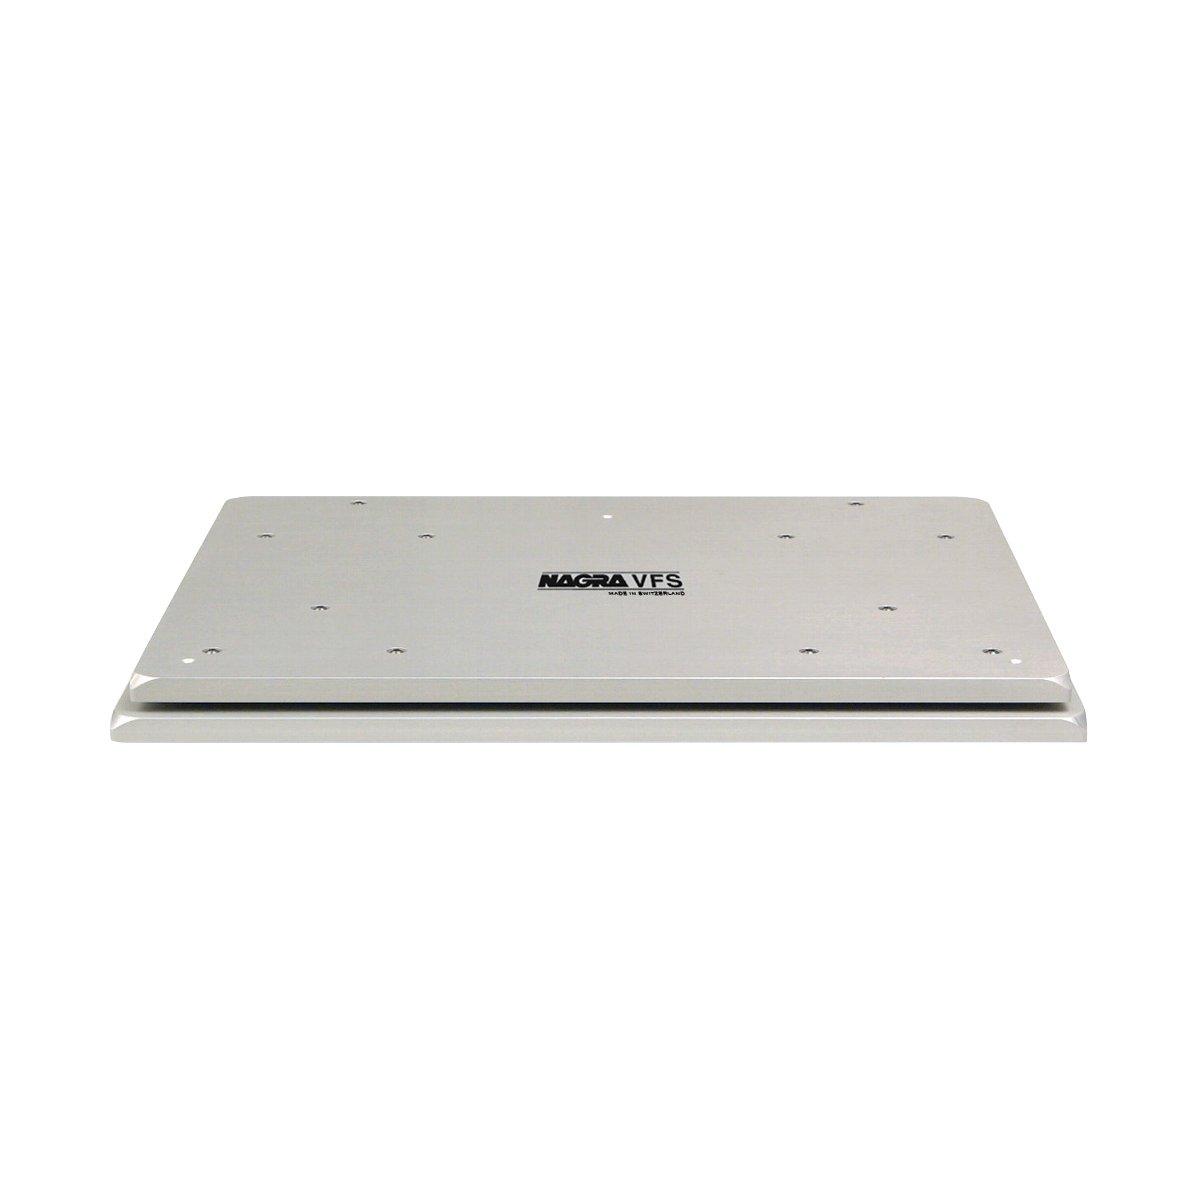 NAGRA VFS-M ナグラ 振動吸収オーディオプレートボード